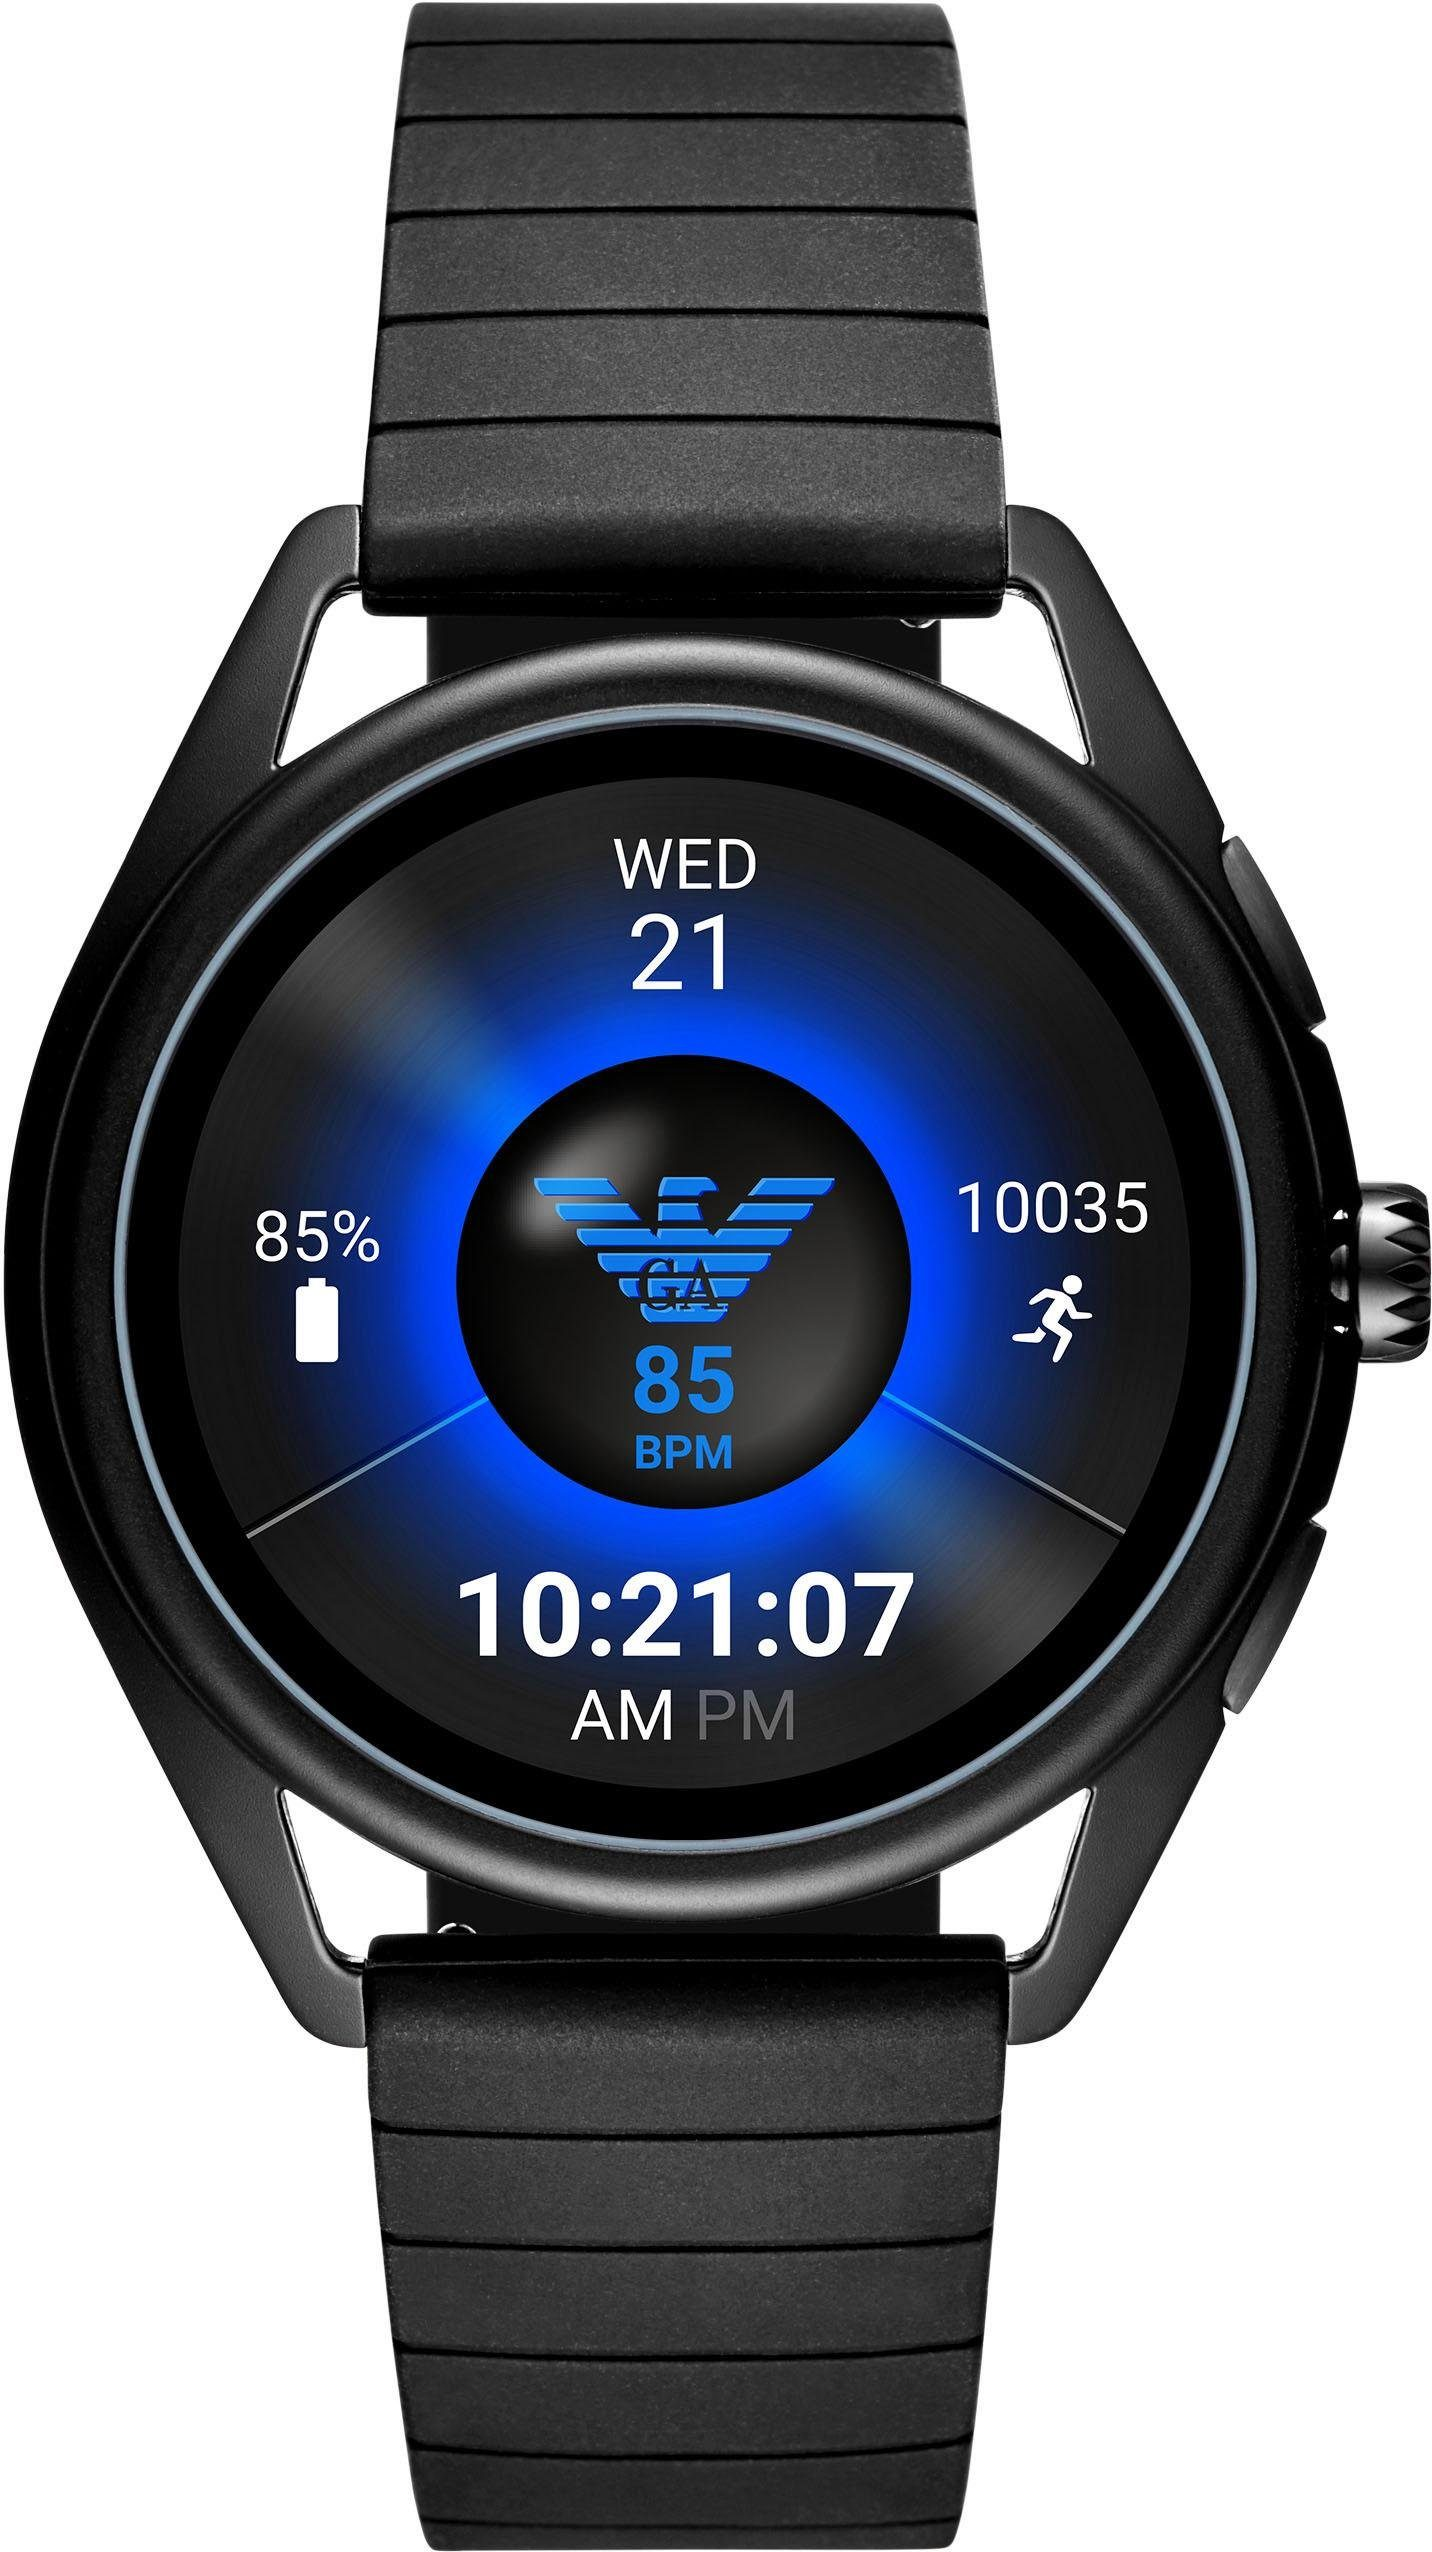 Art5017 ZollWear By Emporio Connected Smartwatch1 Armani Os 19 GoogleOnline KaufenOtto eE2IWD9YHb